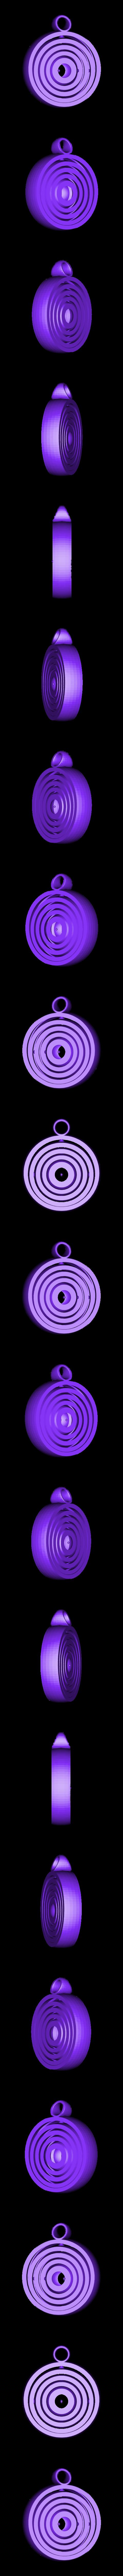 MultiGimble.stl Download free STL file Boron Gimble Keychain • 3D print model, ykratter